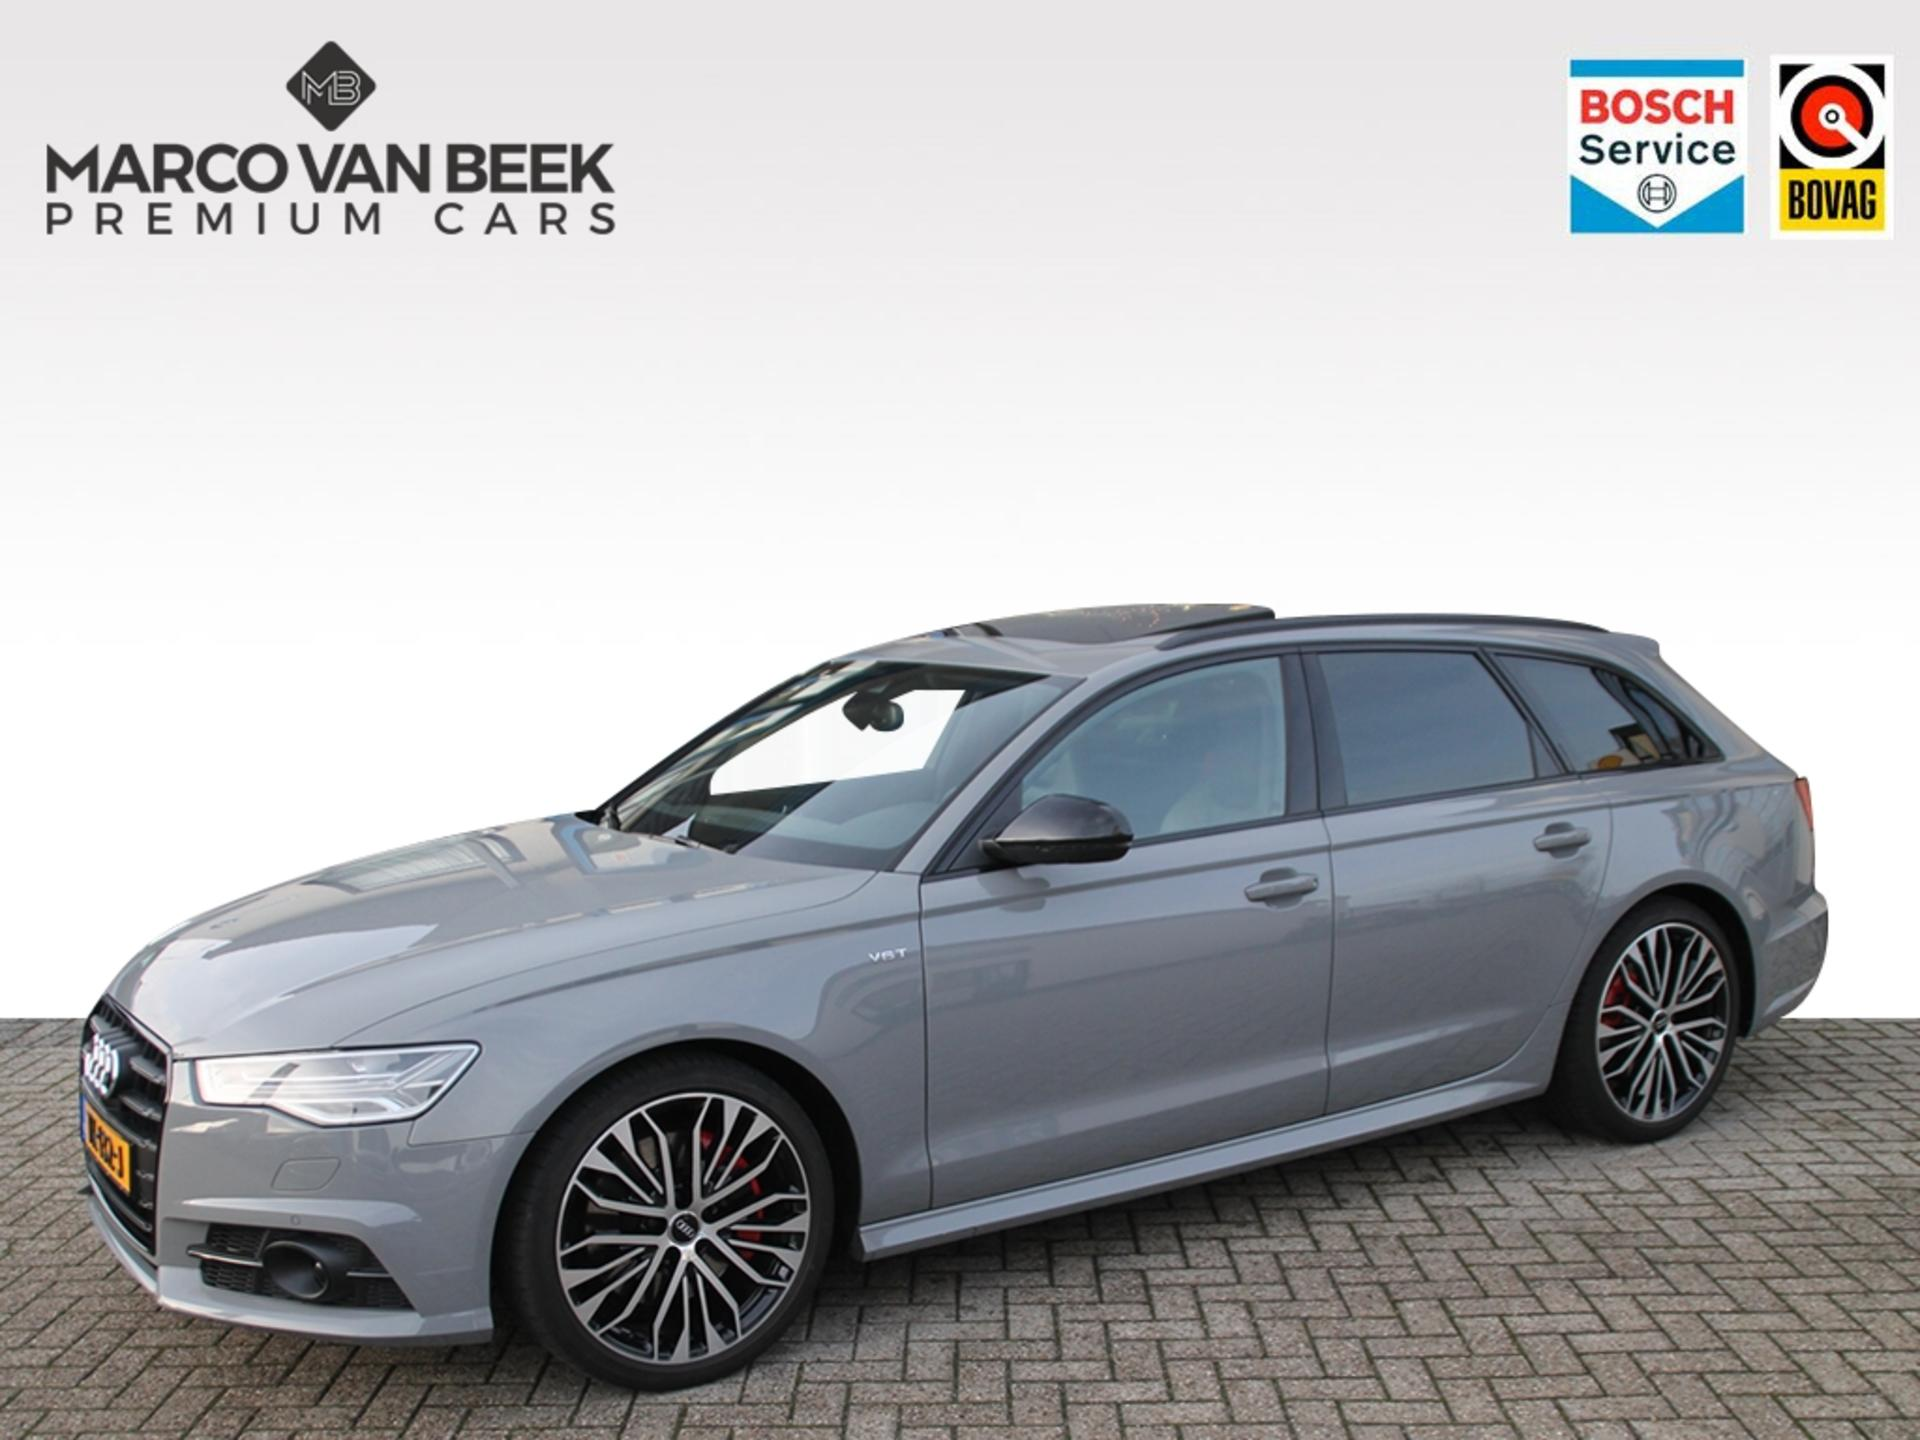 Audi A6 Avant 3.0 tdi bit quattro competition acc pano leer